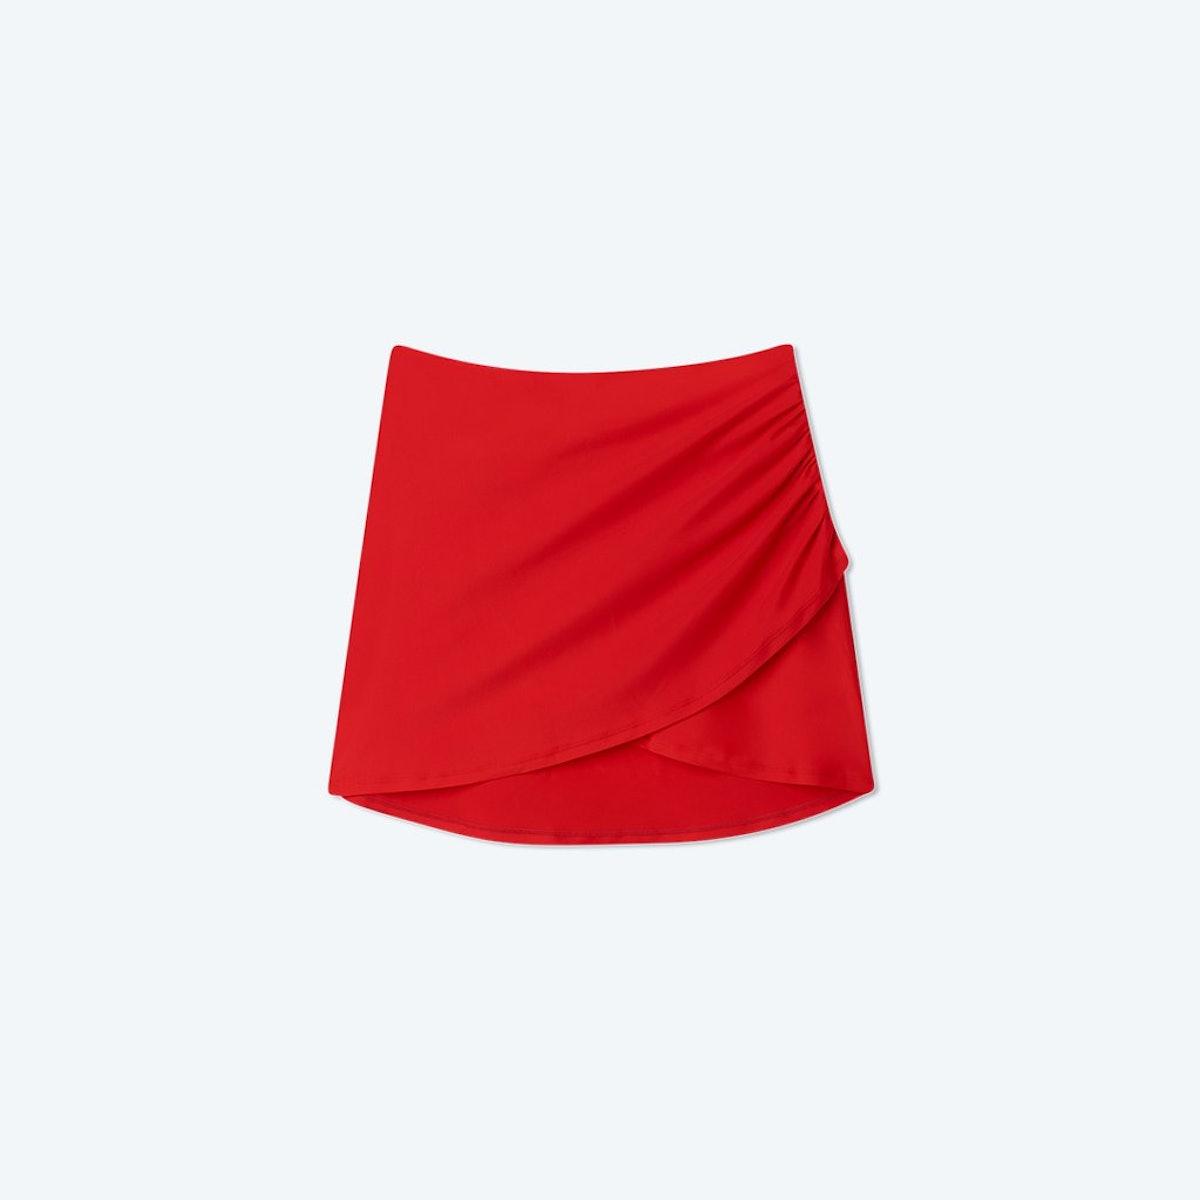 The Ruched Swim Skirt